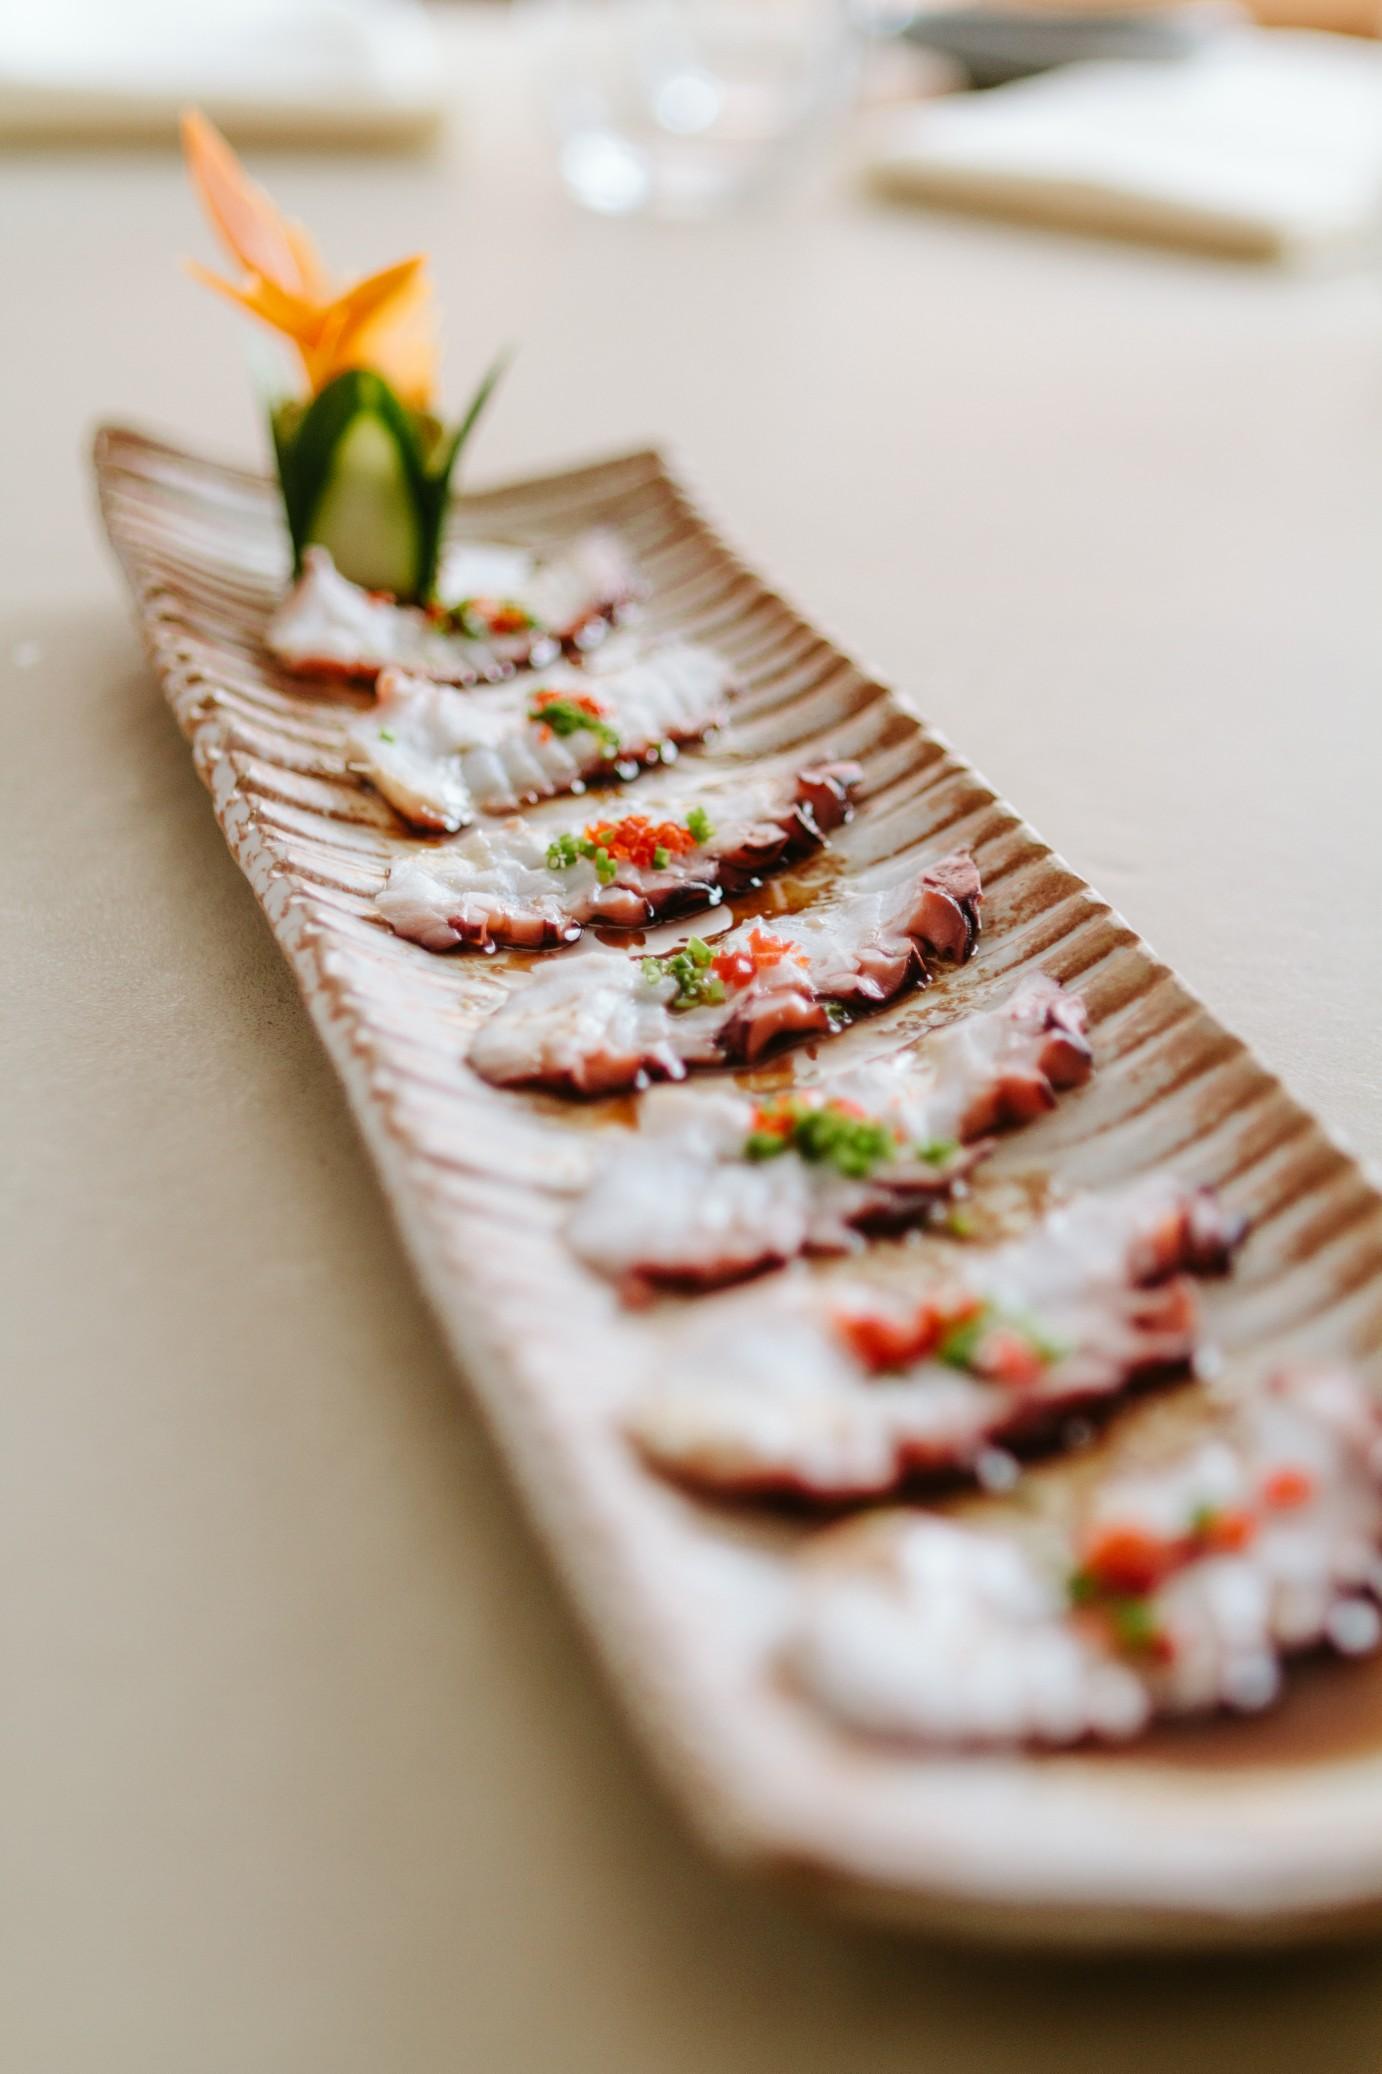 Japanese Sushi Restaurant in Miami Beach Kosushi